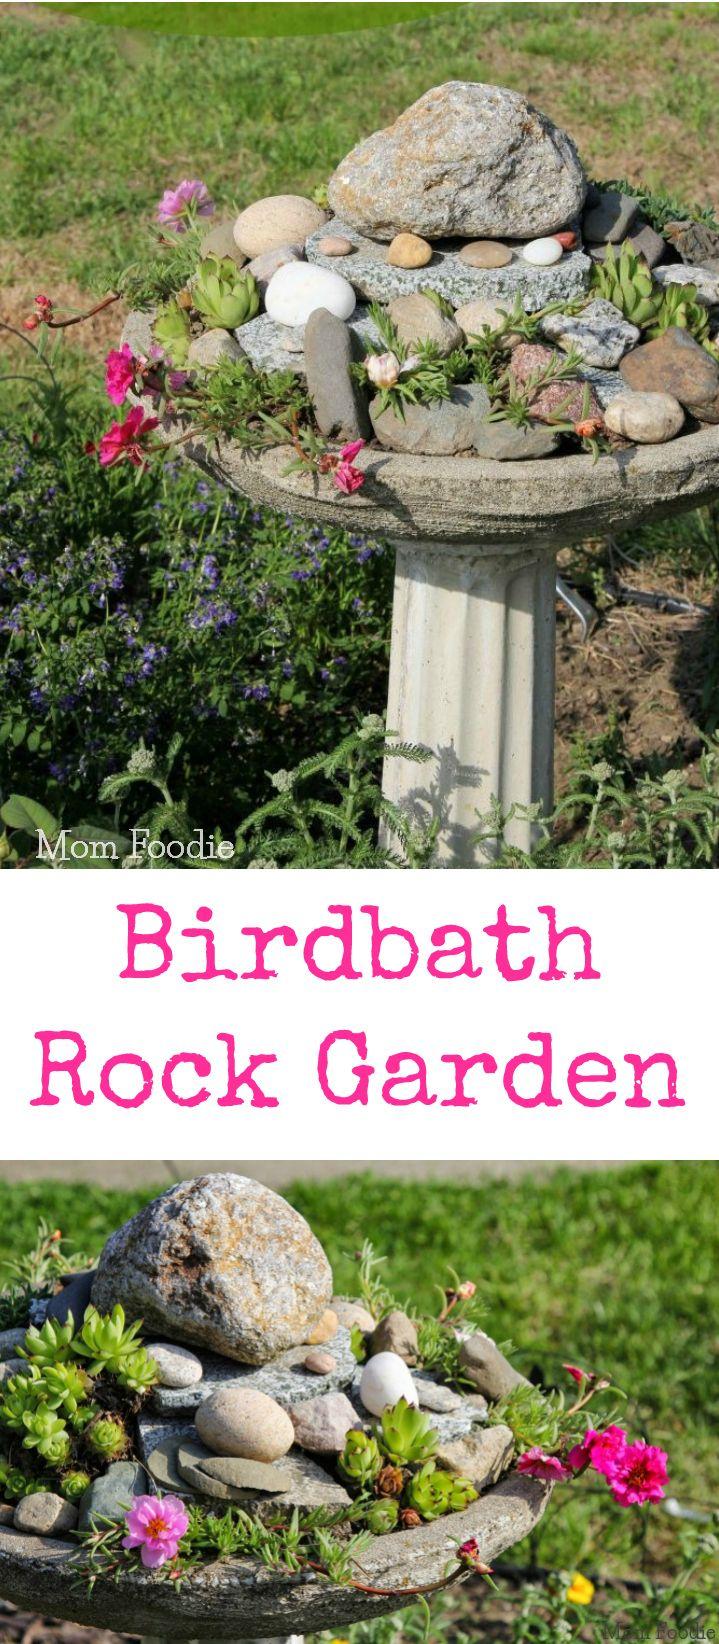 Birdbath Rock Garden Feature